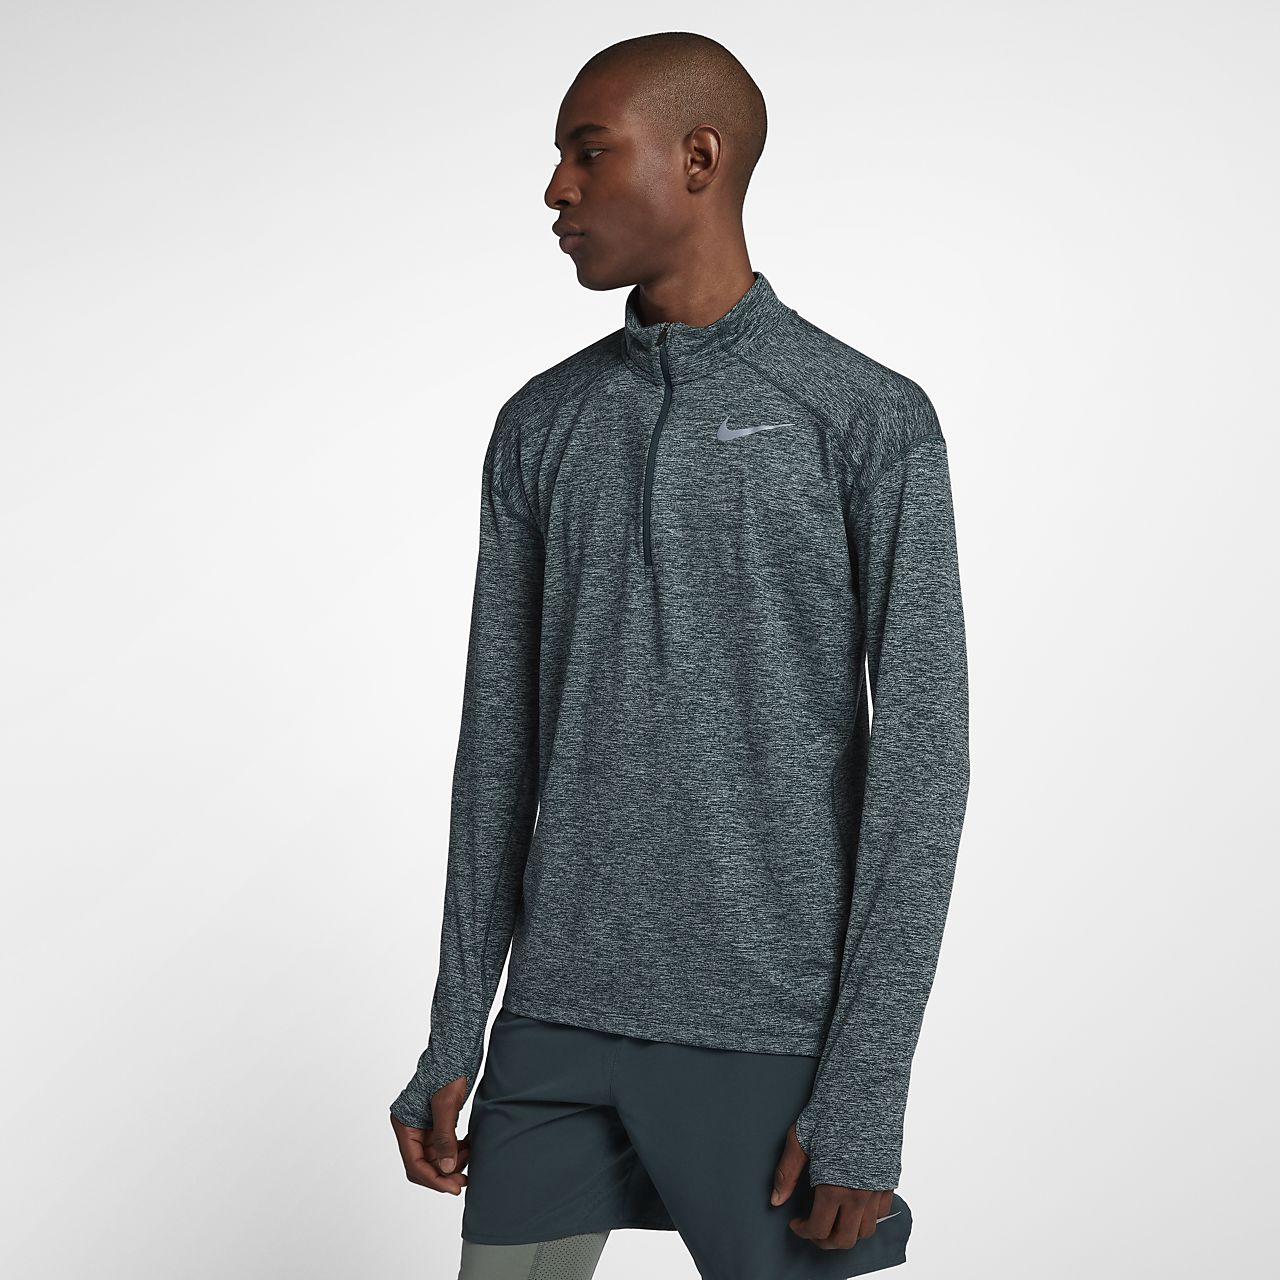 a5fe864d Nike Dri-FIT Men's Long-Sleeve Half-Zip Running Top. Nike.com AU